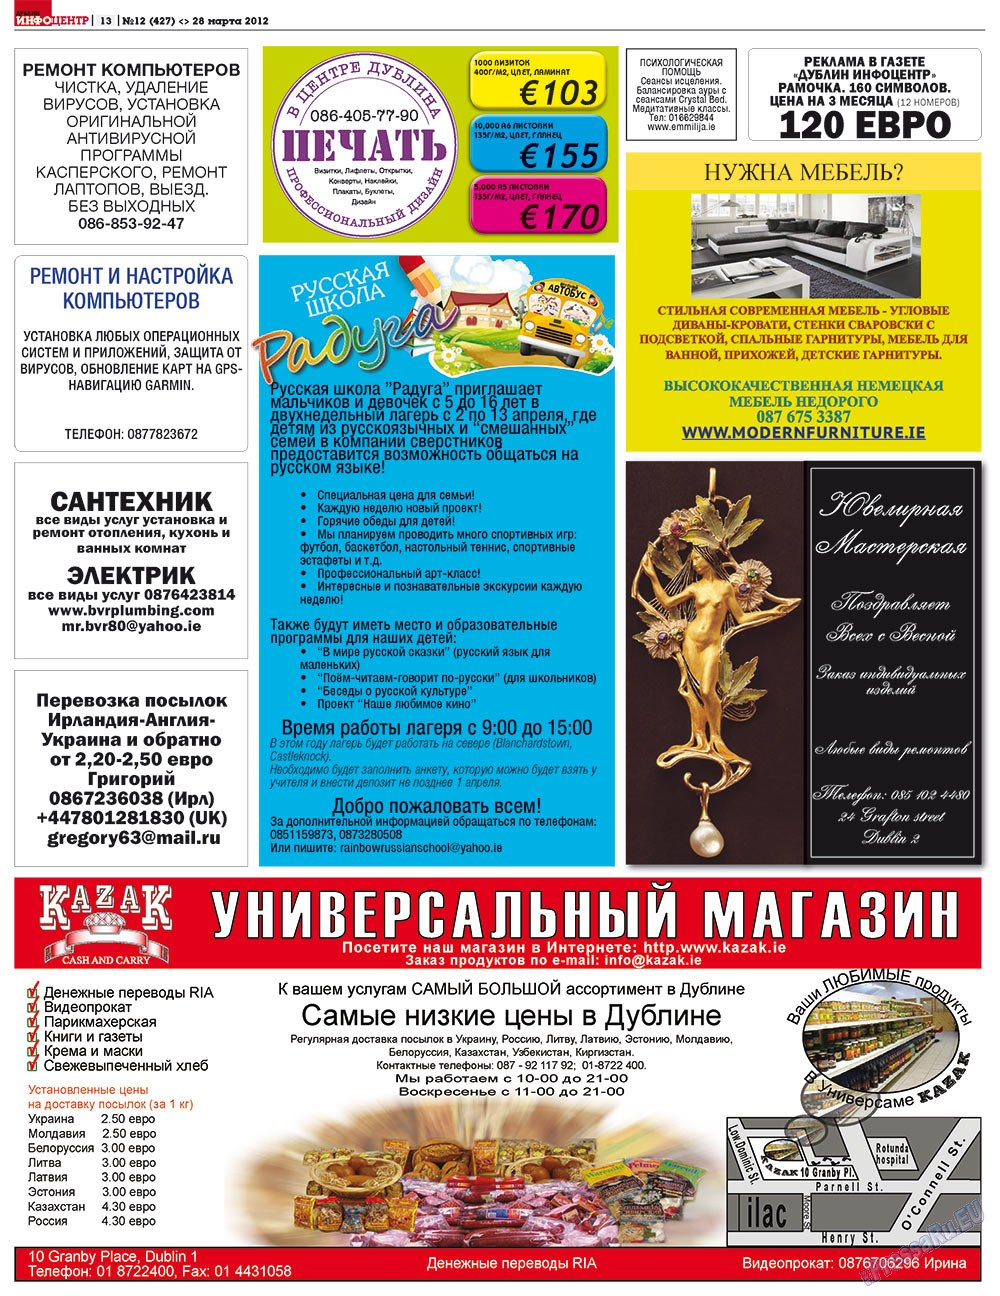 Дублин инфоцентр (газета). 2012 год, номер 12, стр. 13